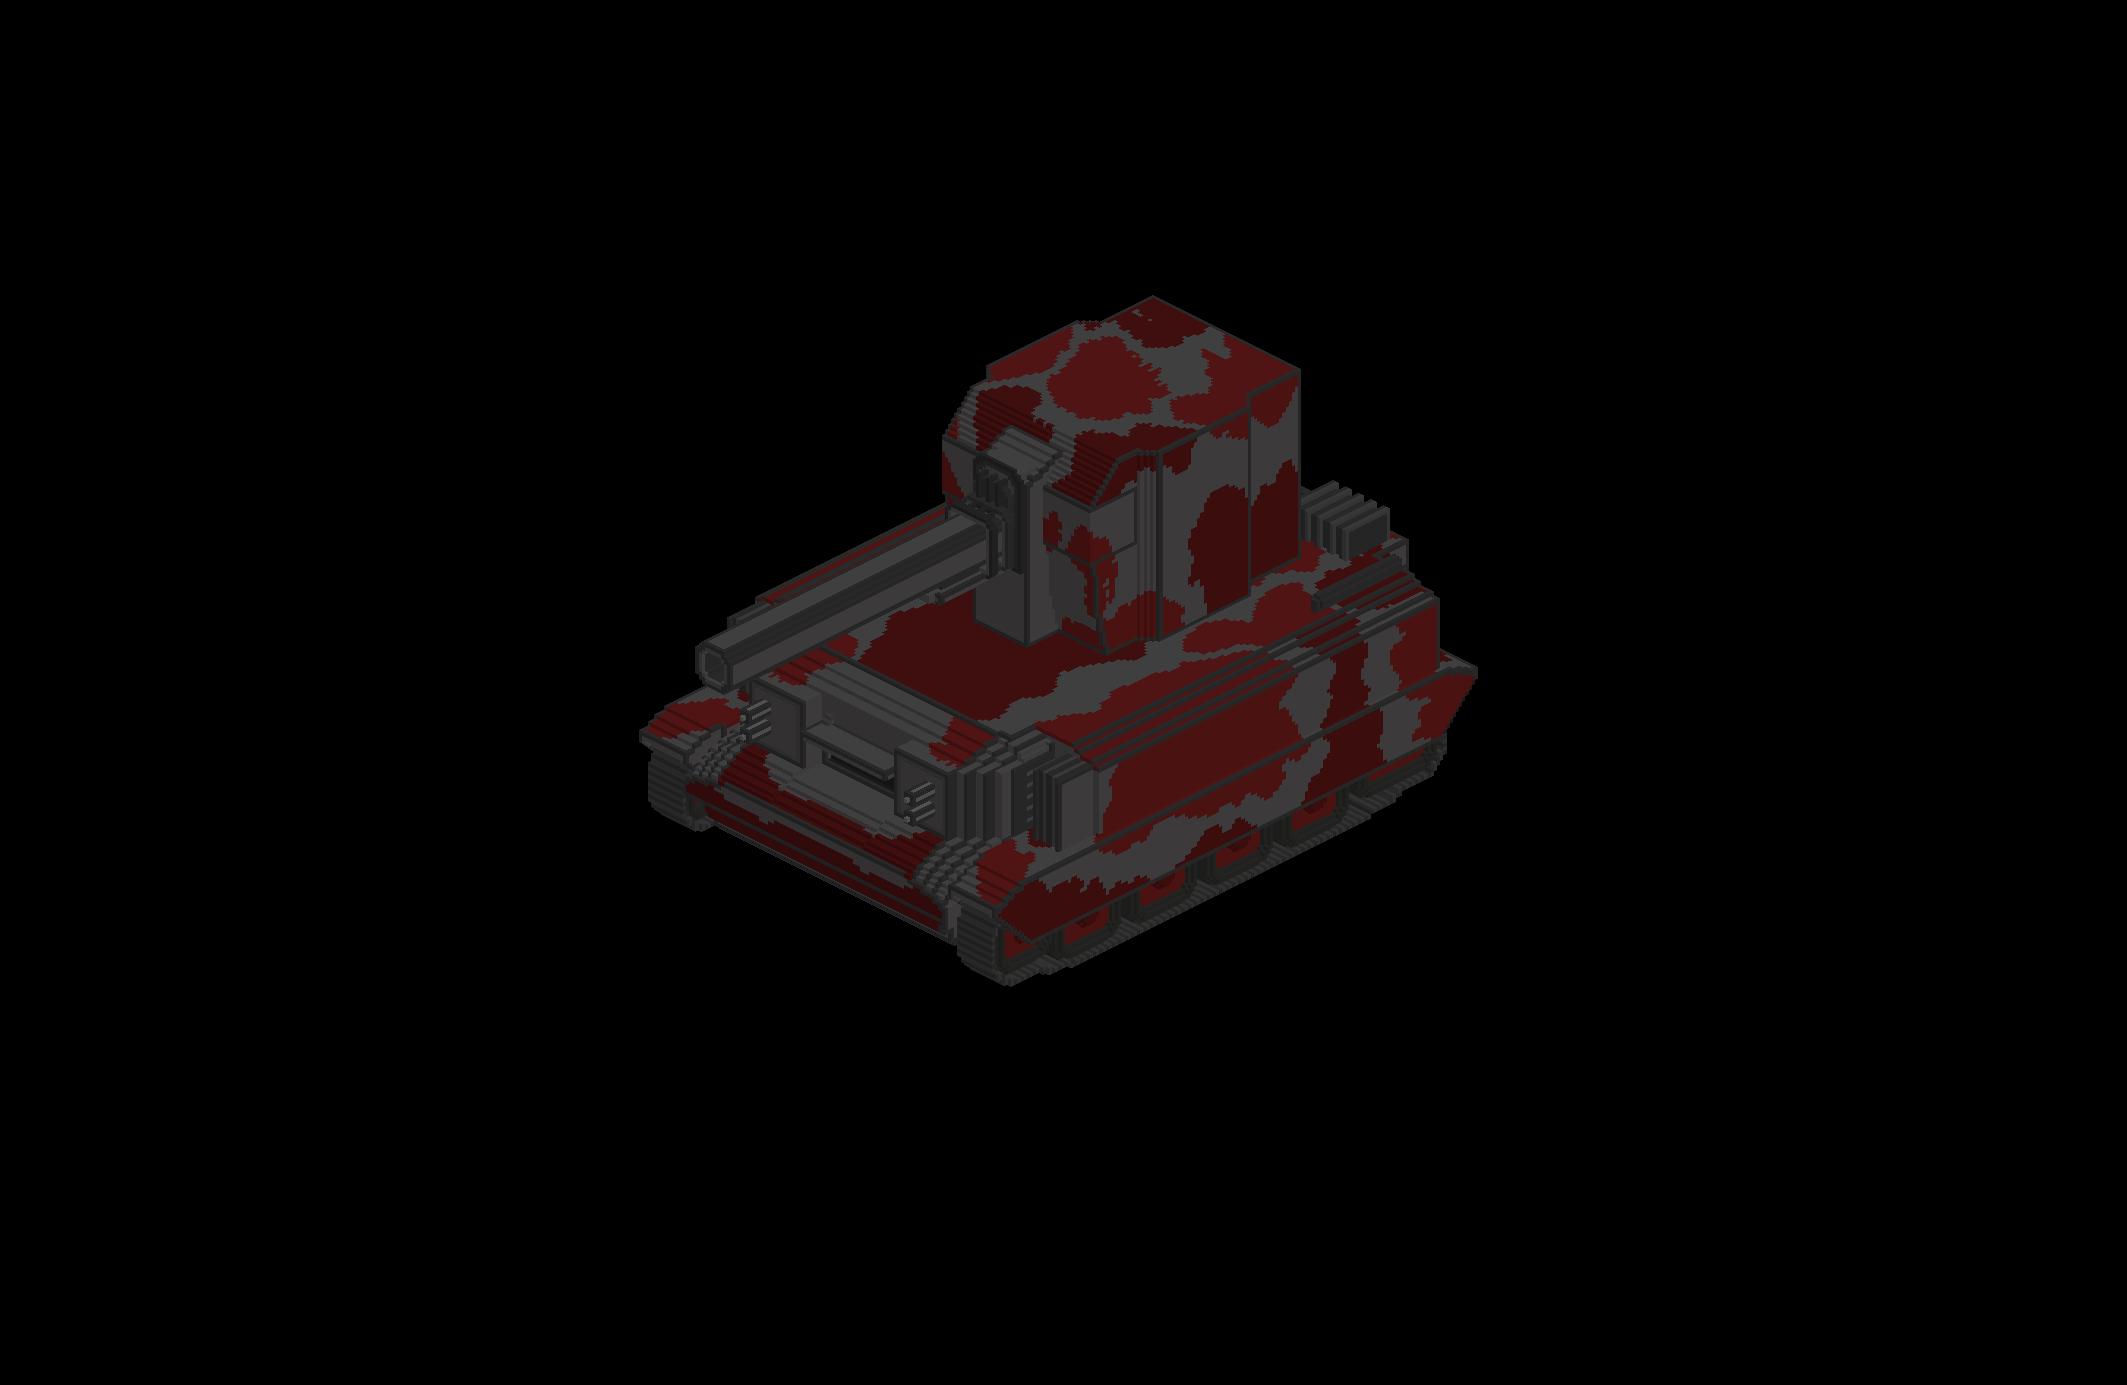 Tank002.png